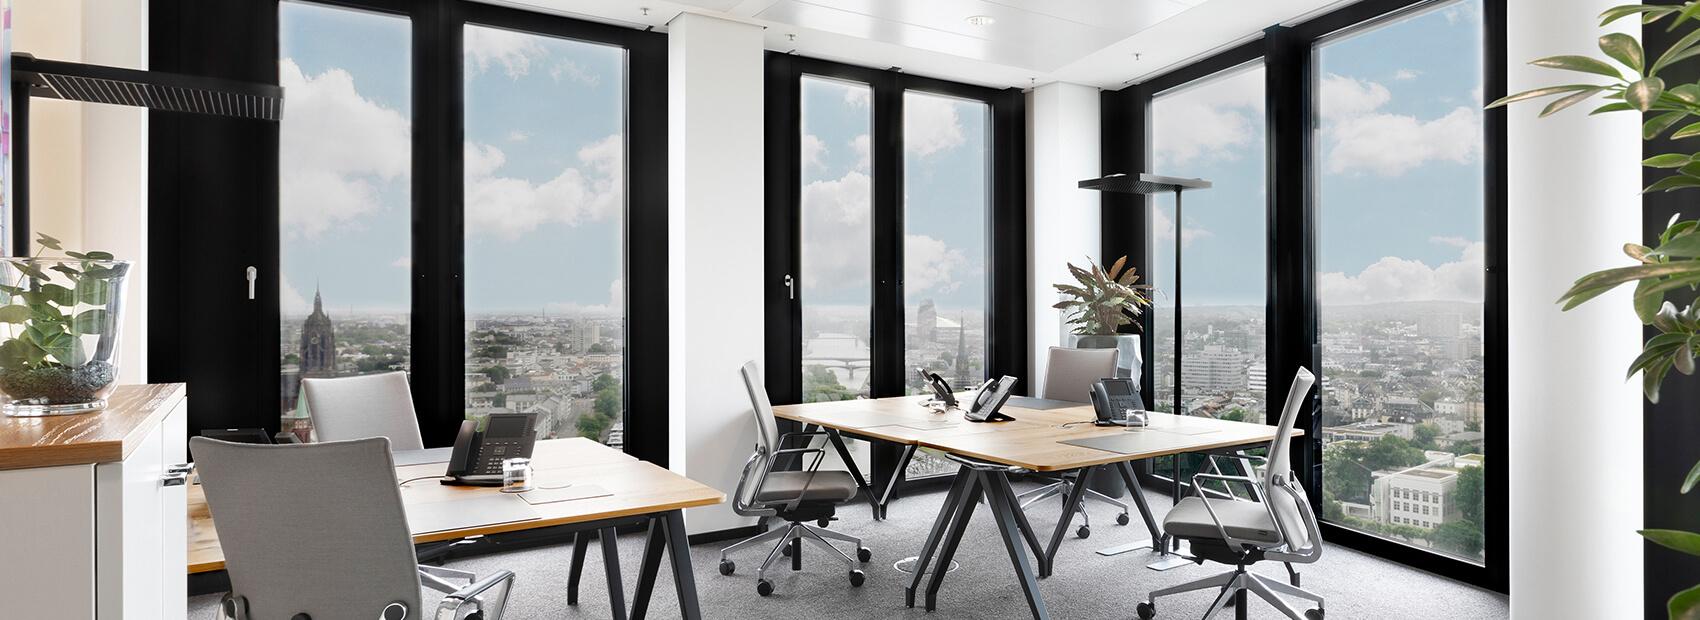 Corporate Office im Office Center